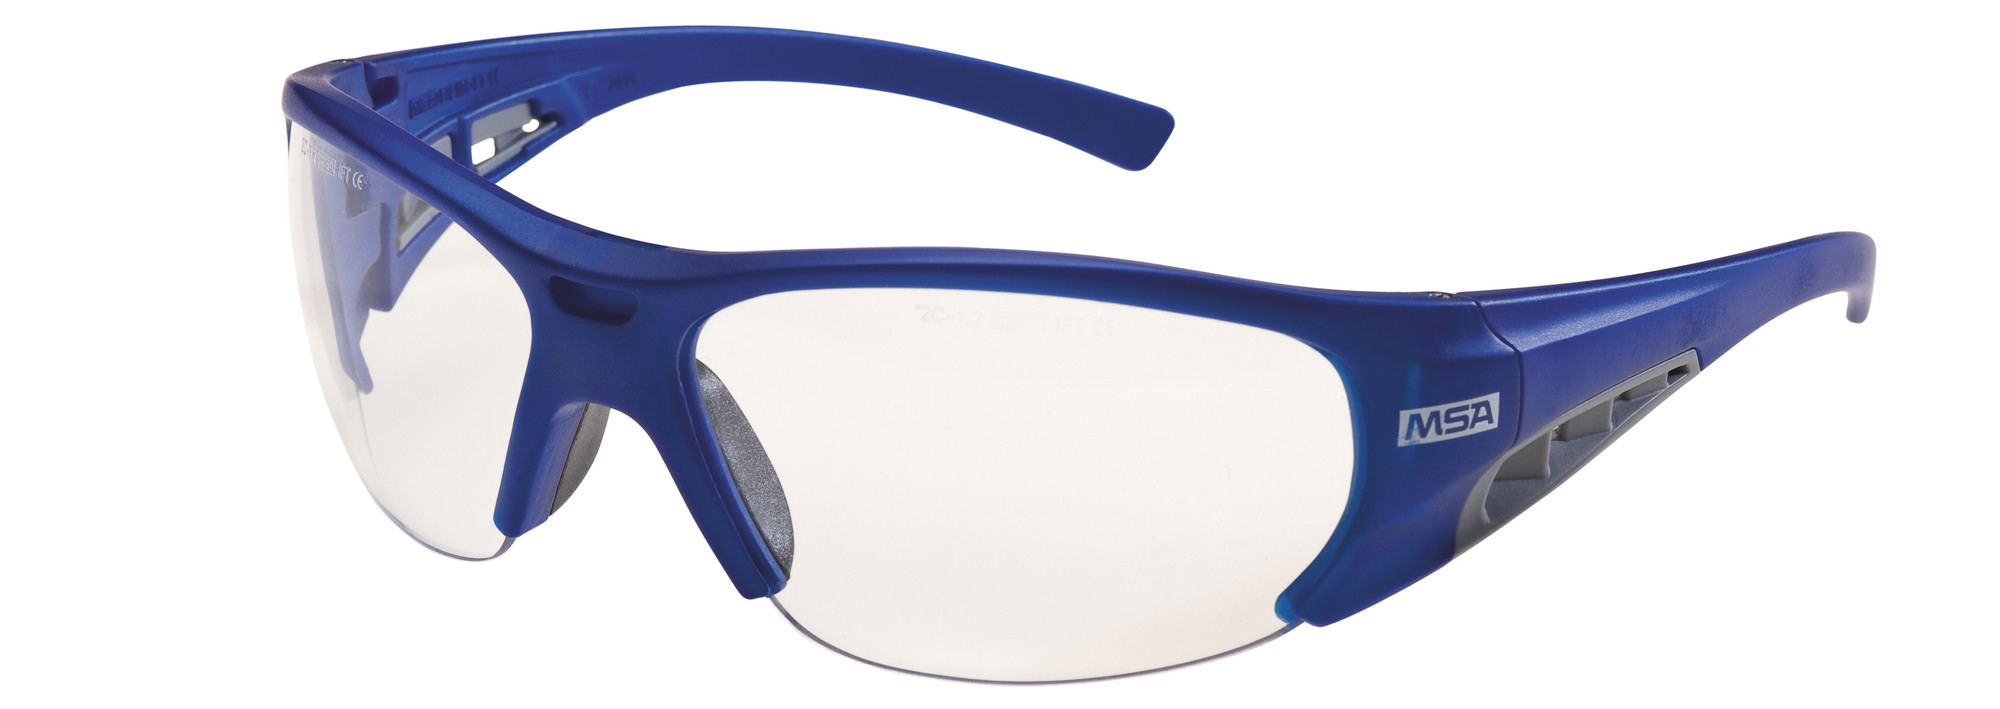 12ST MSA Veiligheidsbril Alternator heldere (Transparant)